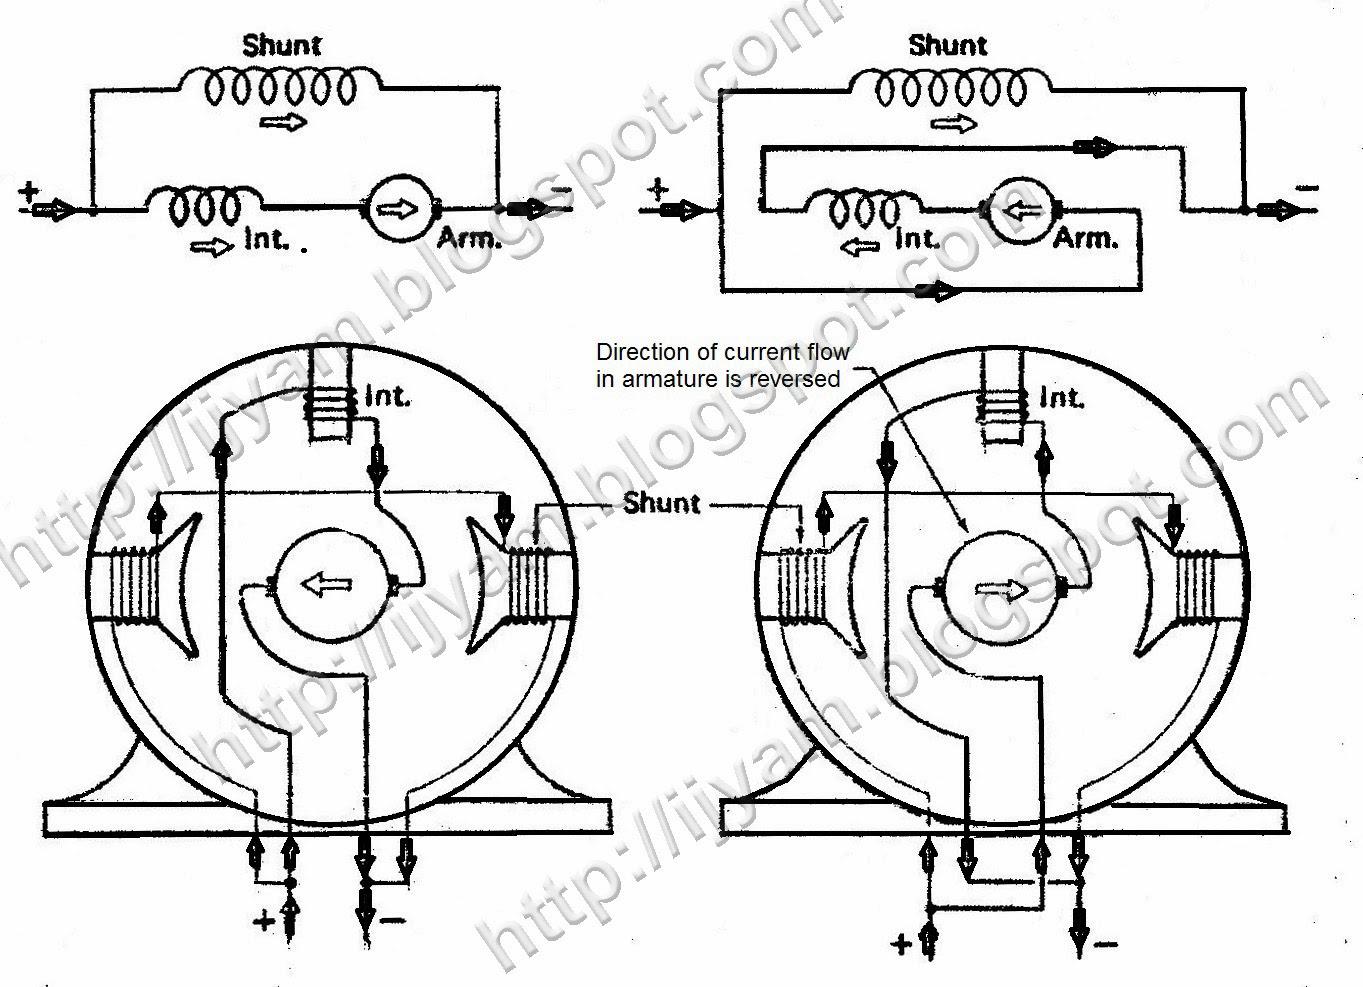 shunt compound motor wiring diagram compress wiring